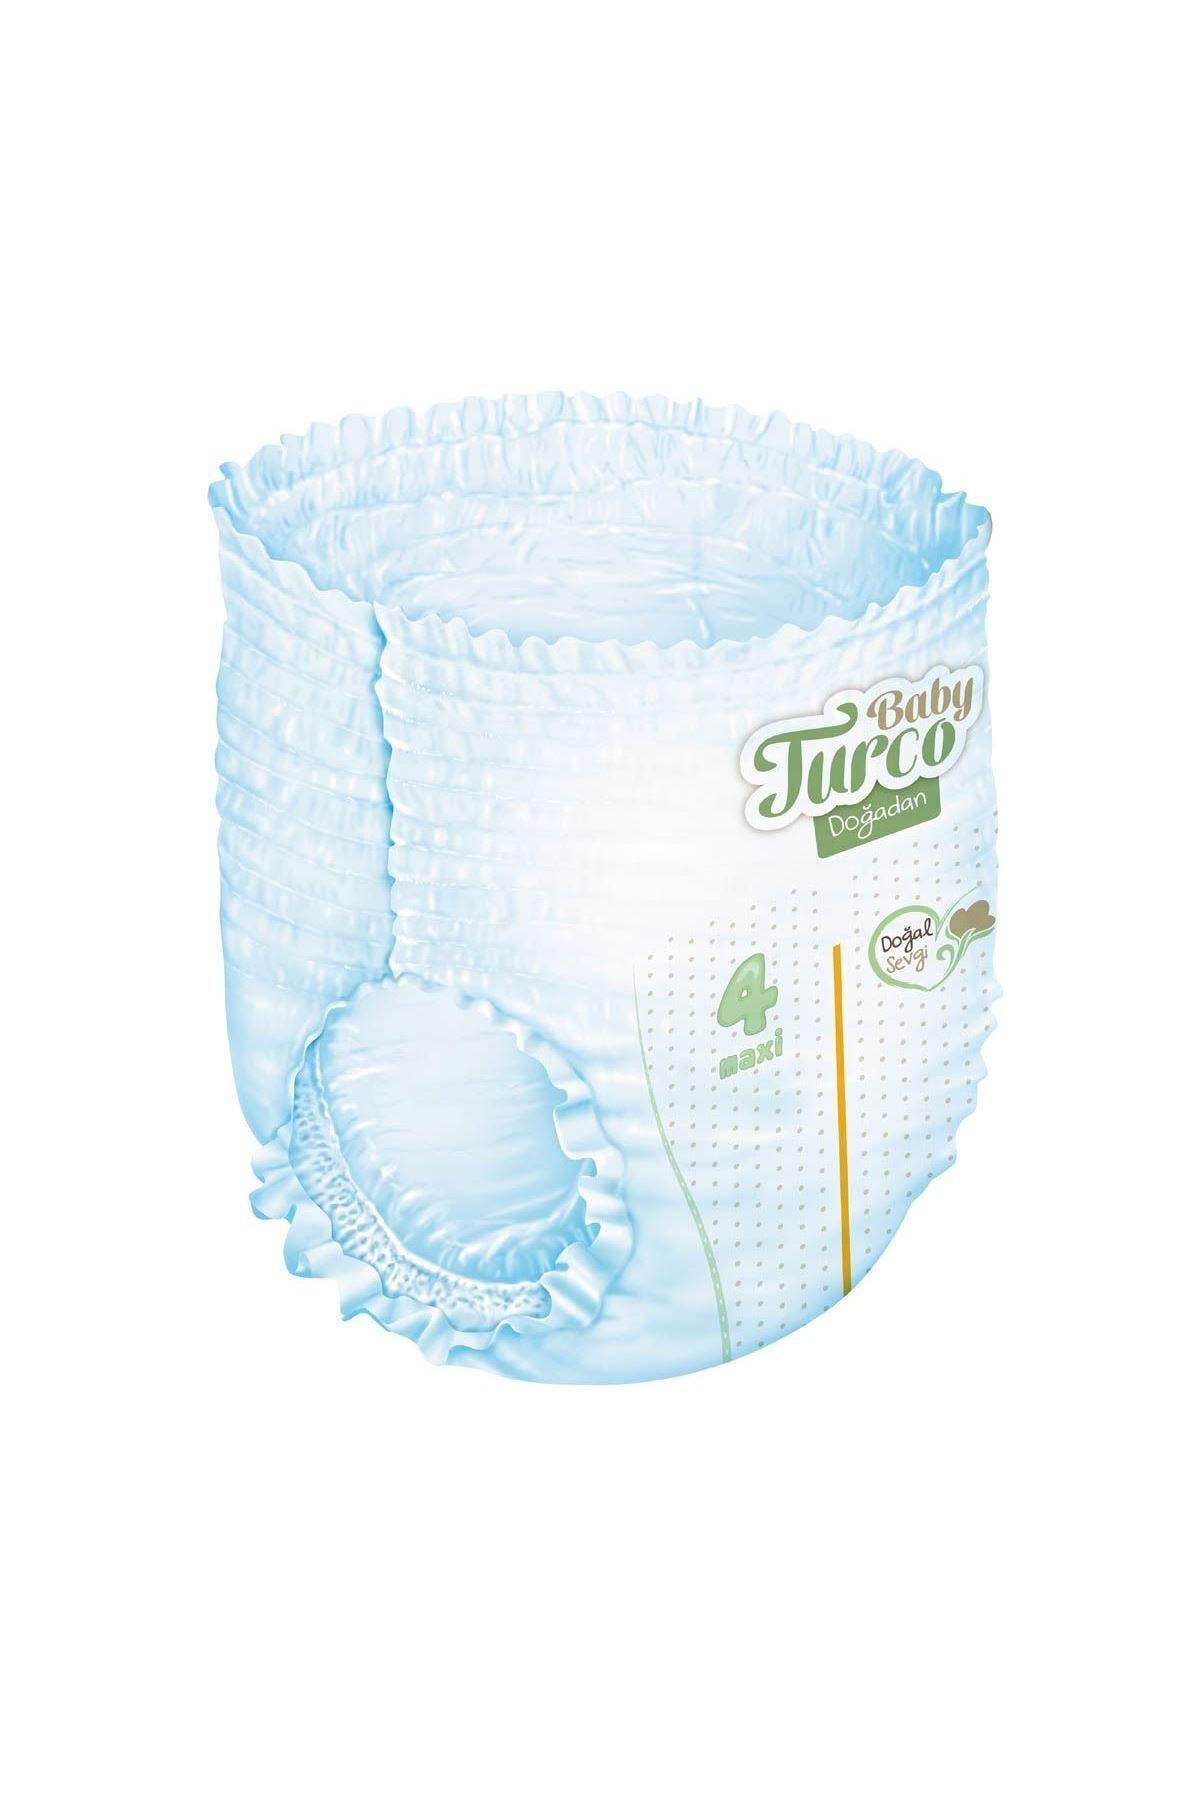 Baby Turco Doğadan Külot Bez 6 Numara Xlarge 100 Adet 2